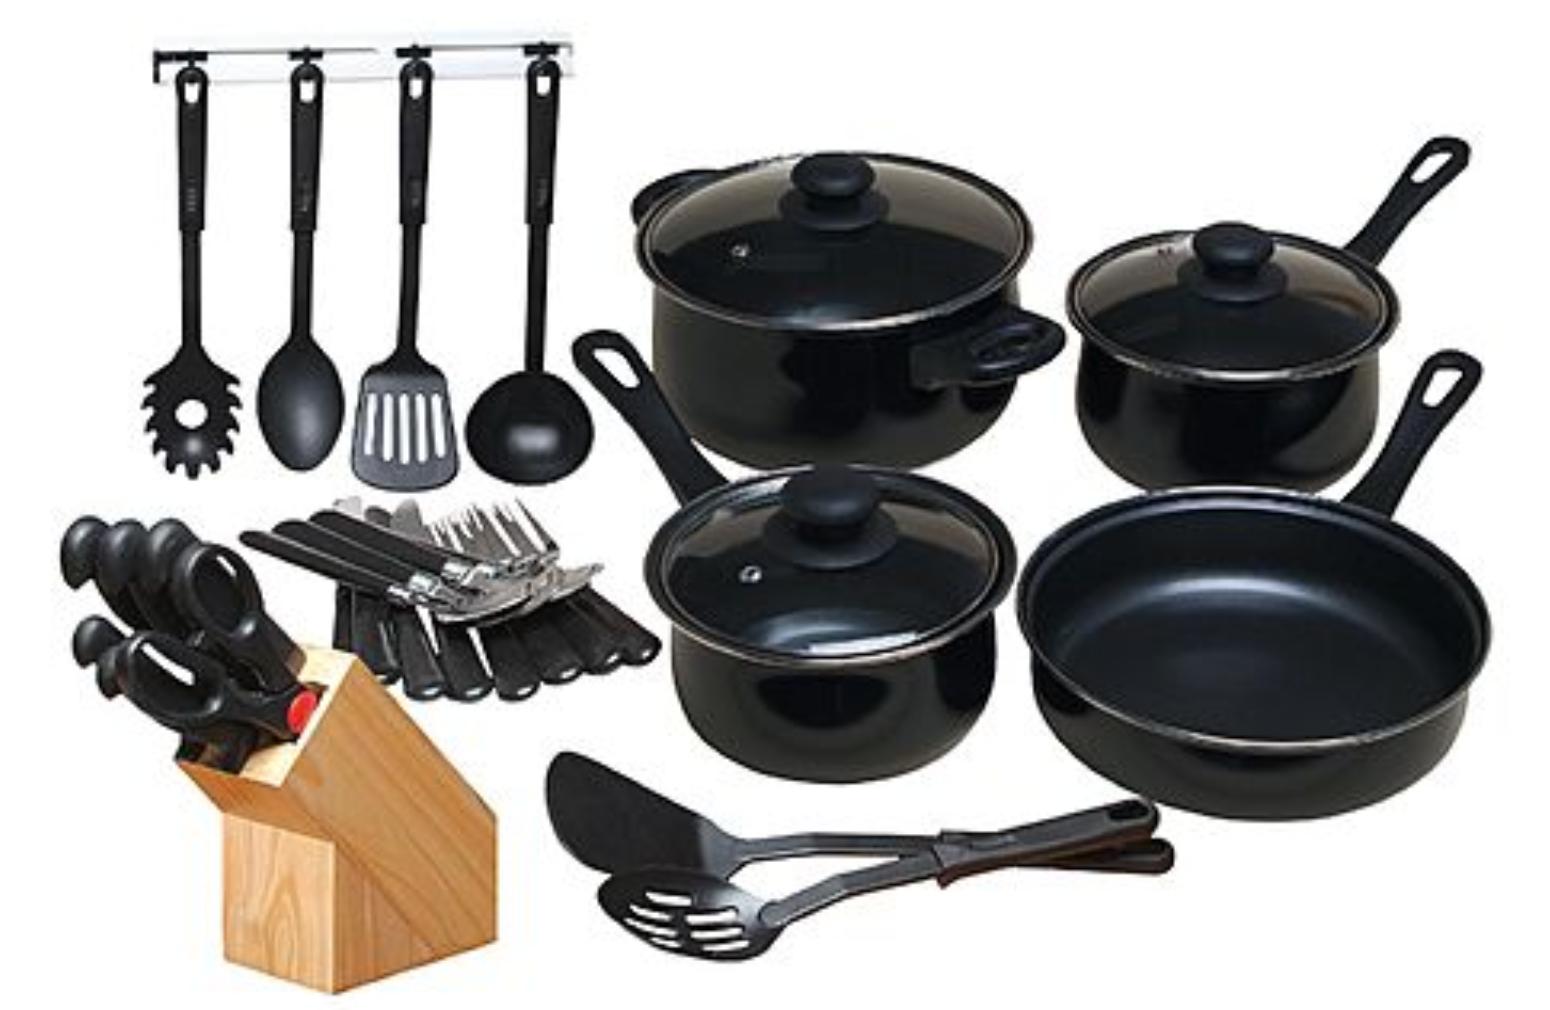 kitchen-vessels-set-kitchen-vessels-set-sears-outlet-cuisine-select ...